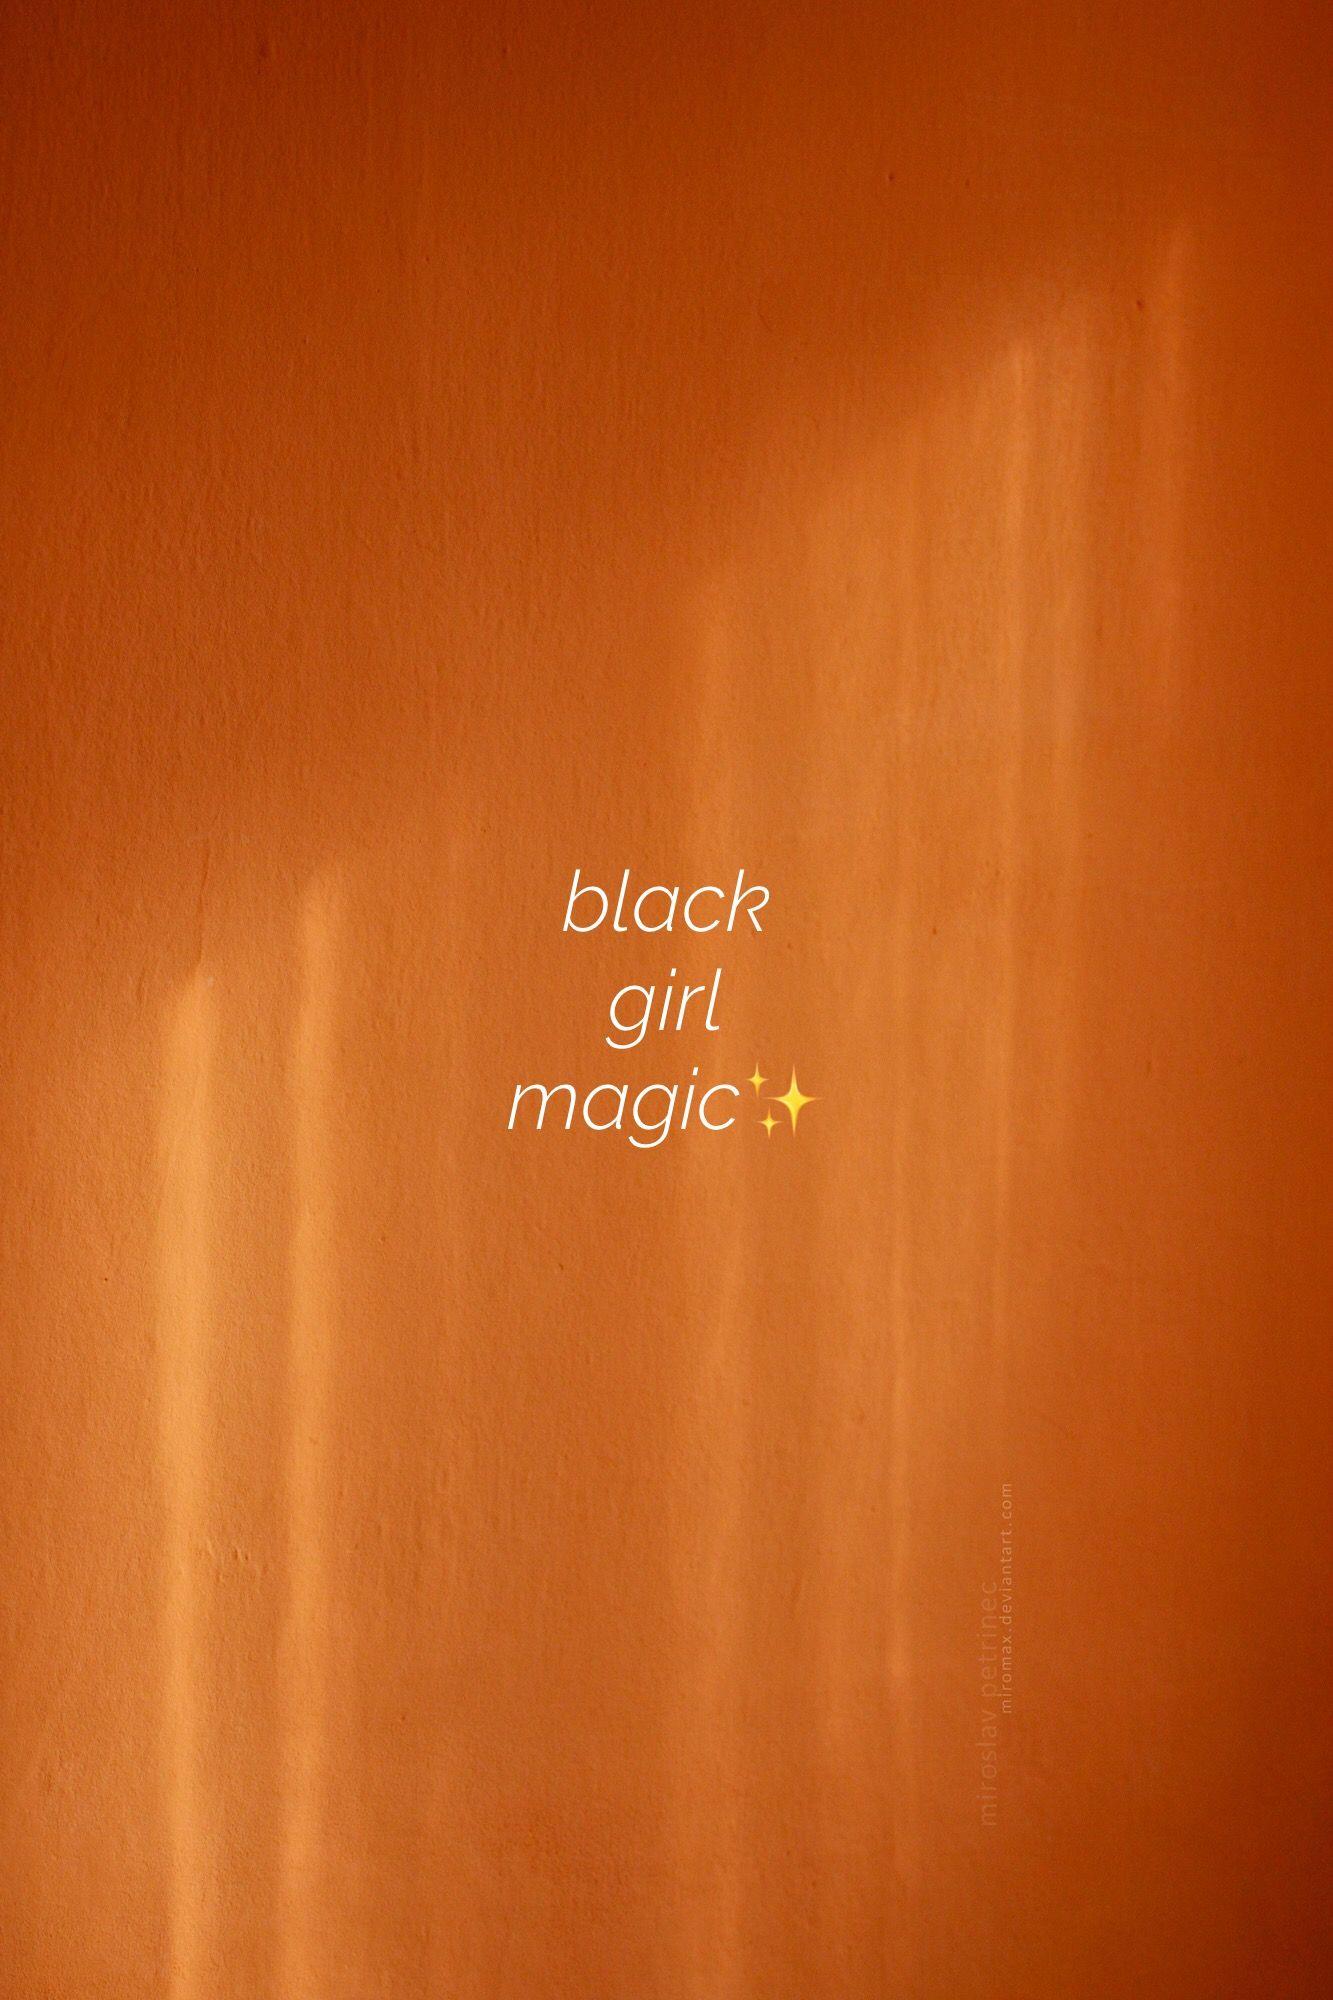 Black Girl Magic Made By Me Black Girl Magic Magic Aesthetic Black Girl Quotes